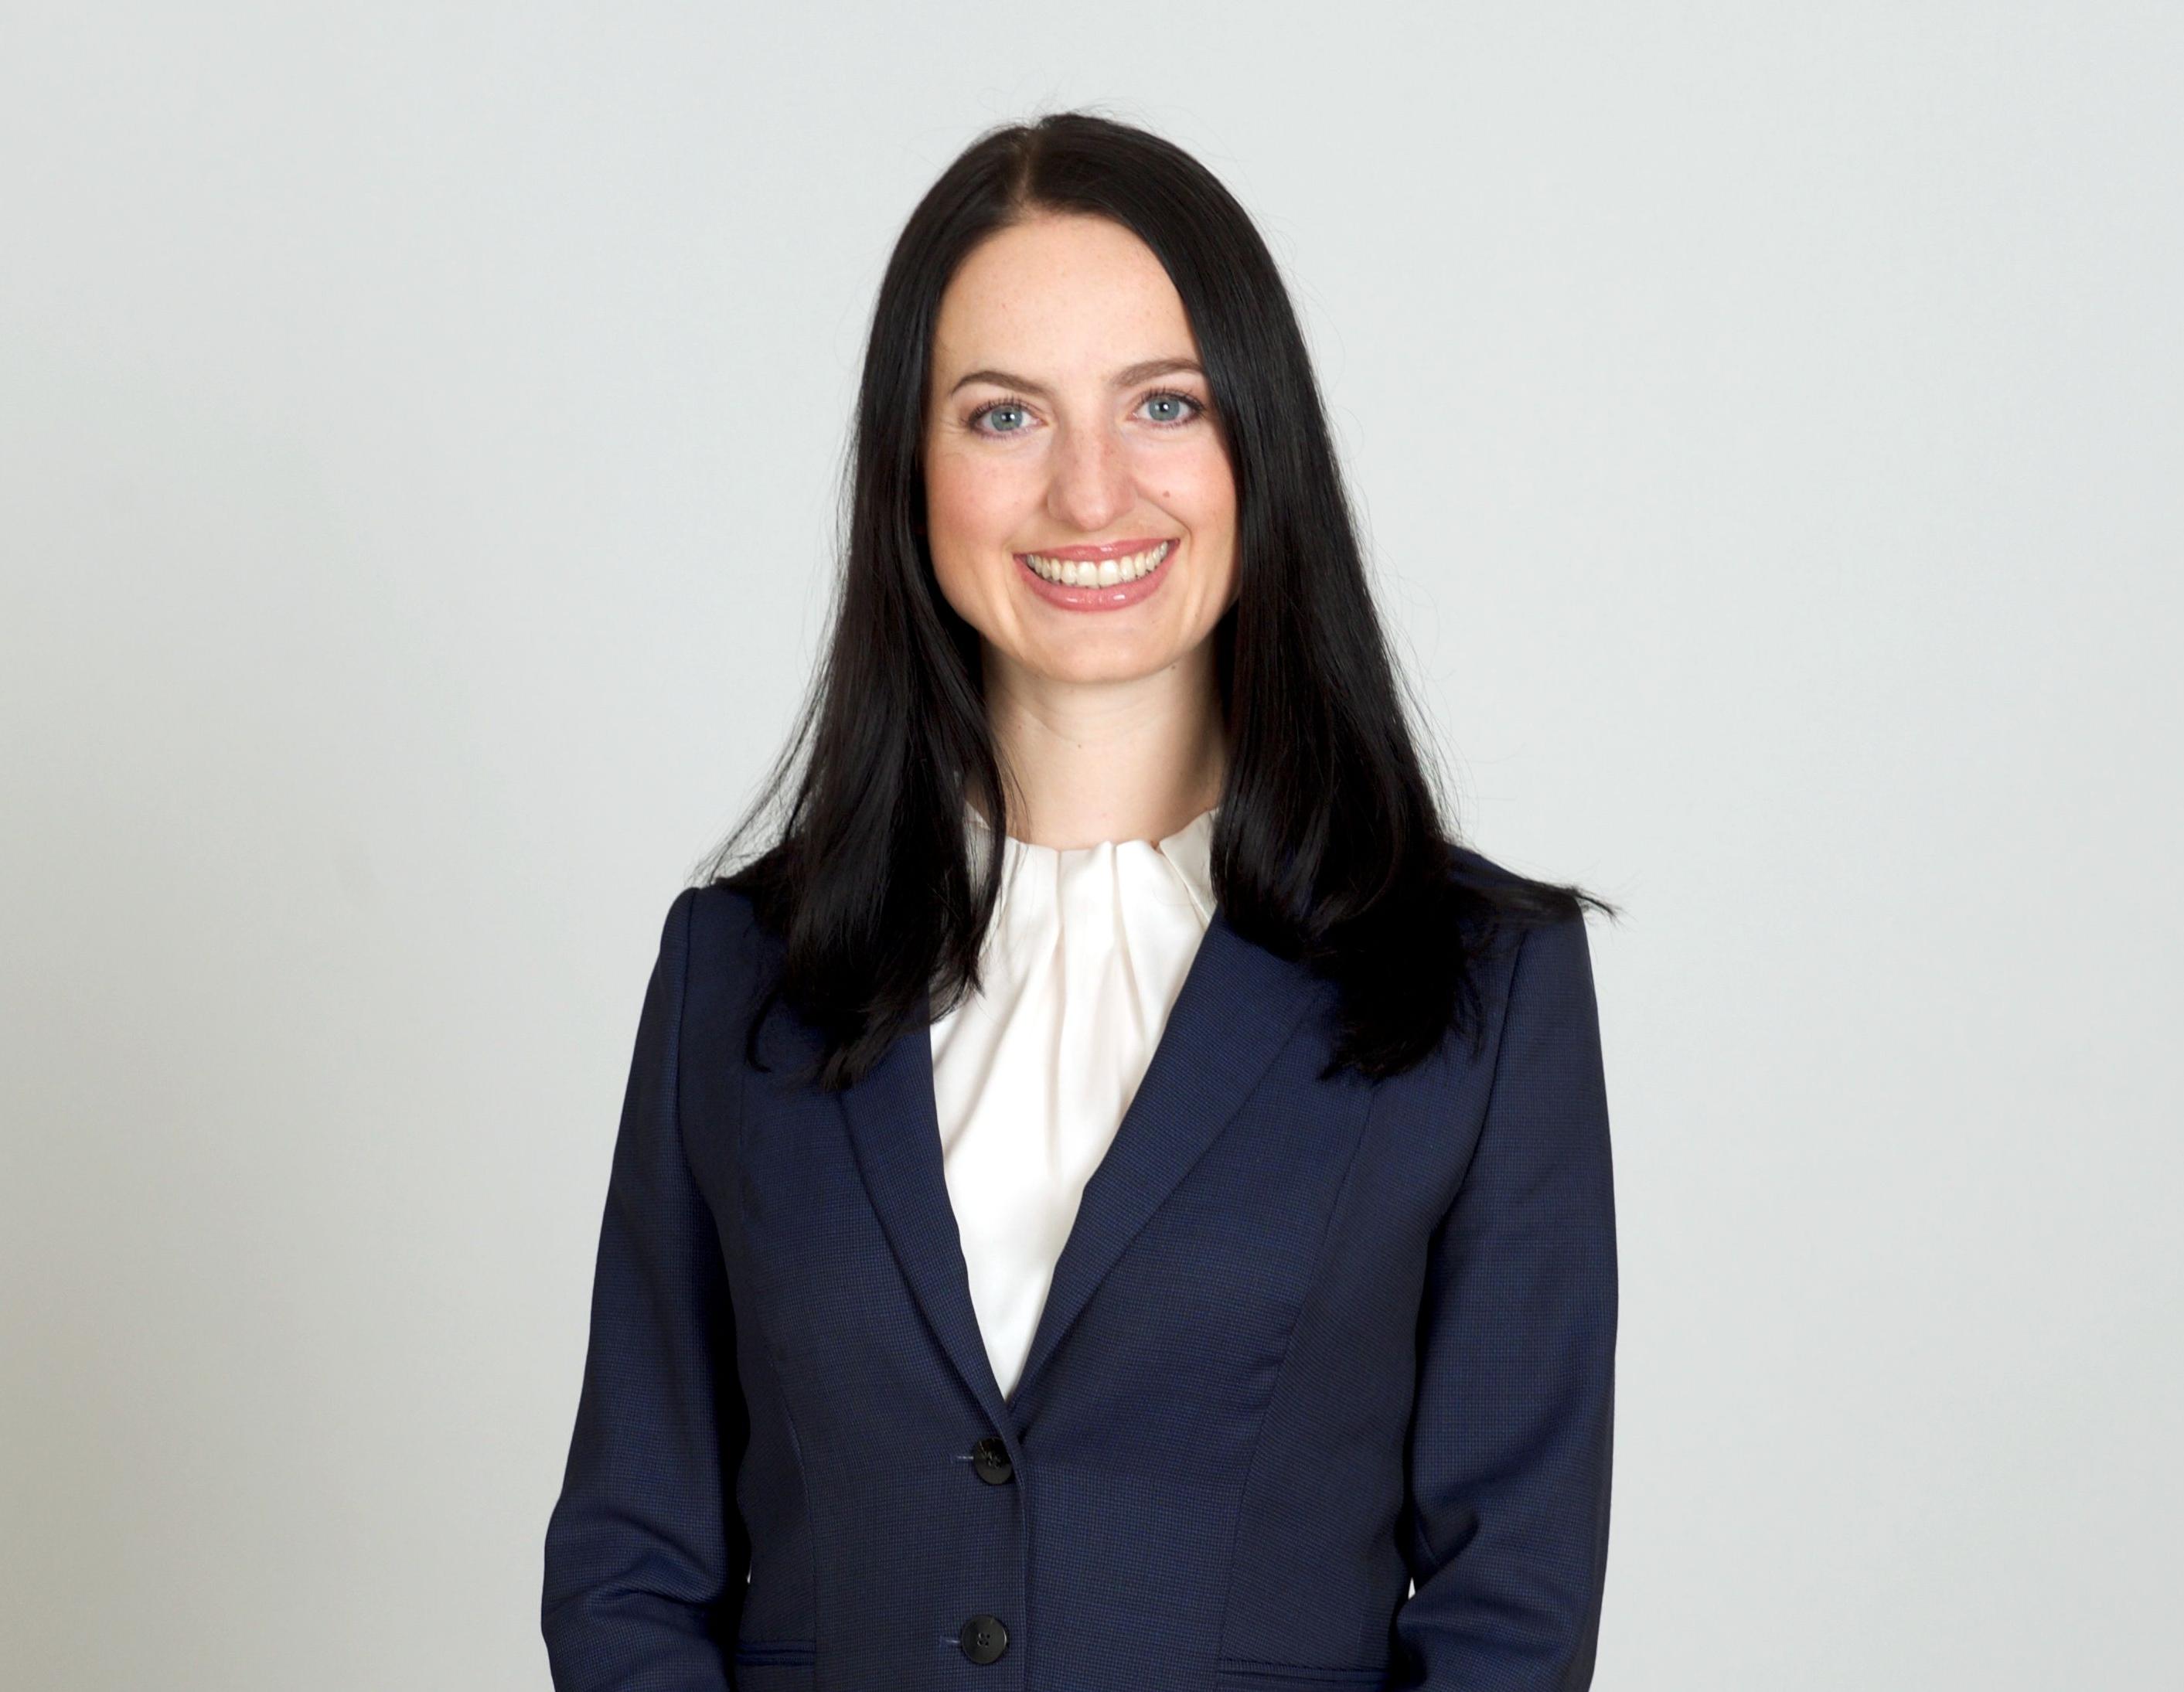 julia obermeier - Markus Soder Lebenslauf